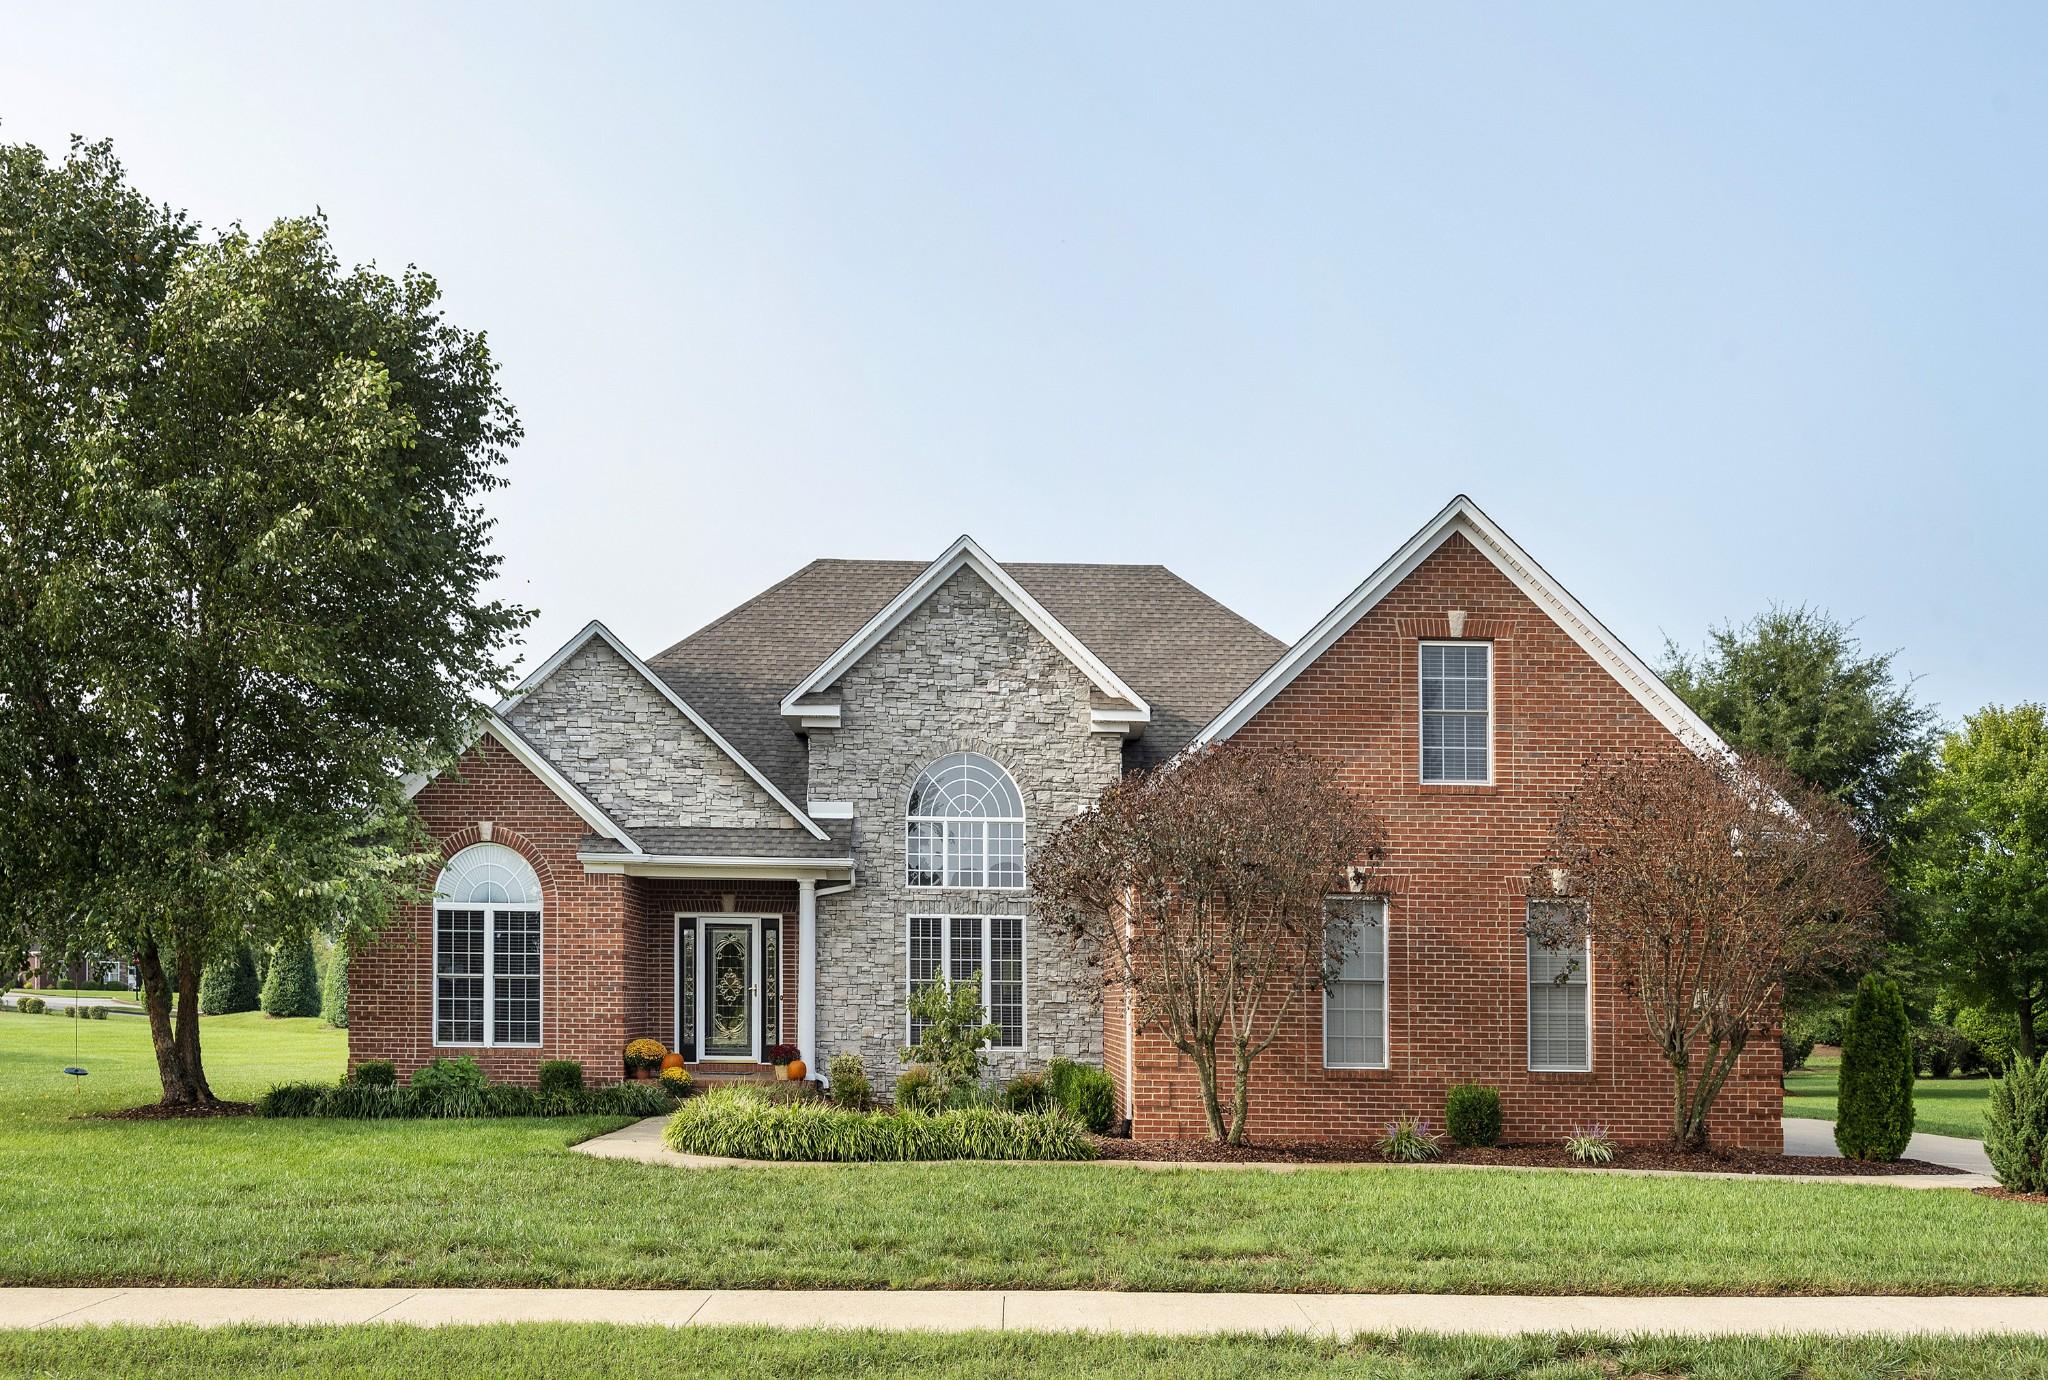 117 Cynthia Lynn Dr Property Photo - Bowling Green, KY real estate listing